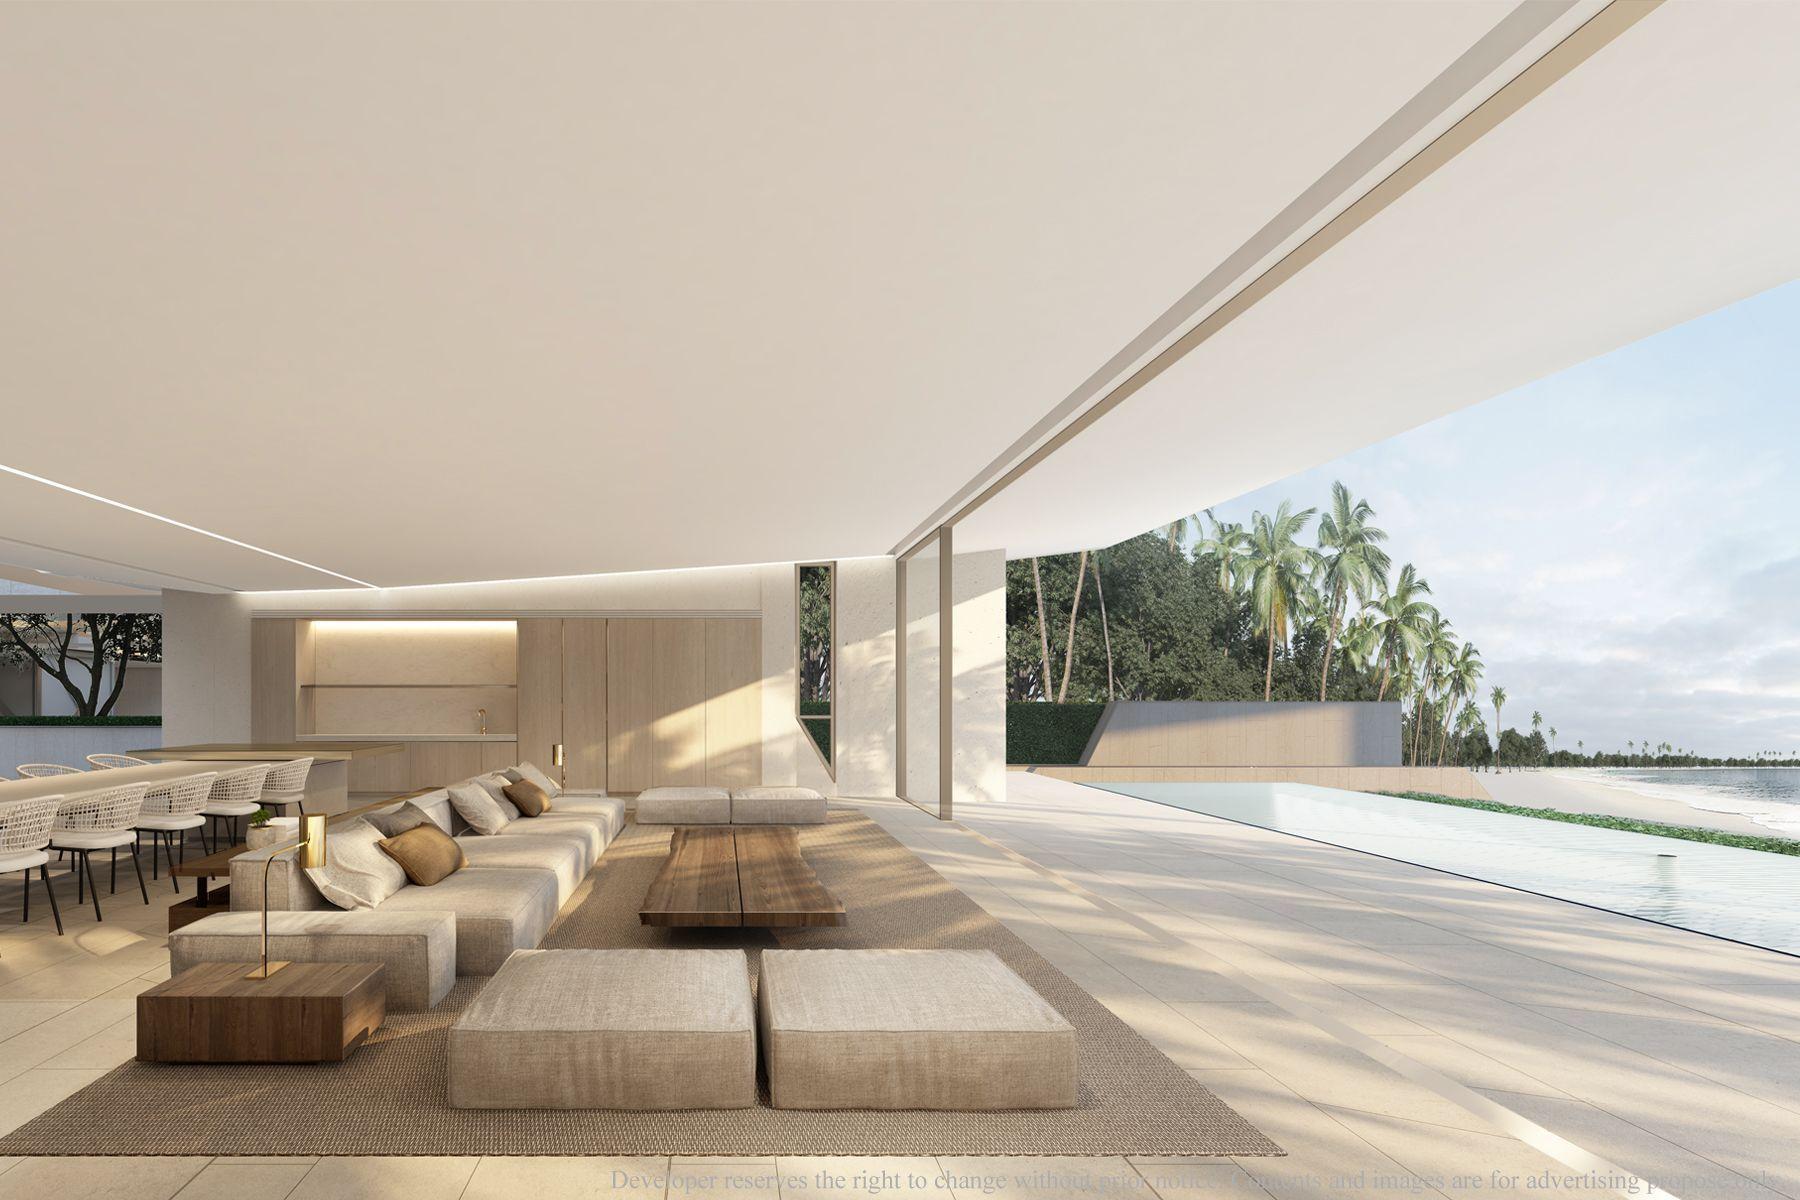 Land for Sale at Veyla Natai Residences - Veyla Beach Villa 3006 Rural Roads 3006, Khok Kloi, Takua Thung Other Phangnga, Phangnga 82140 Thailand